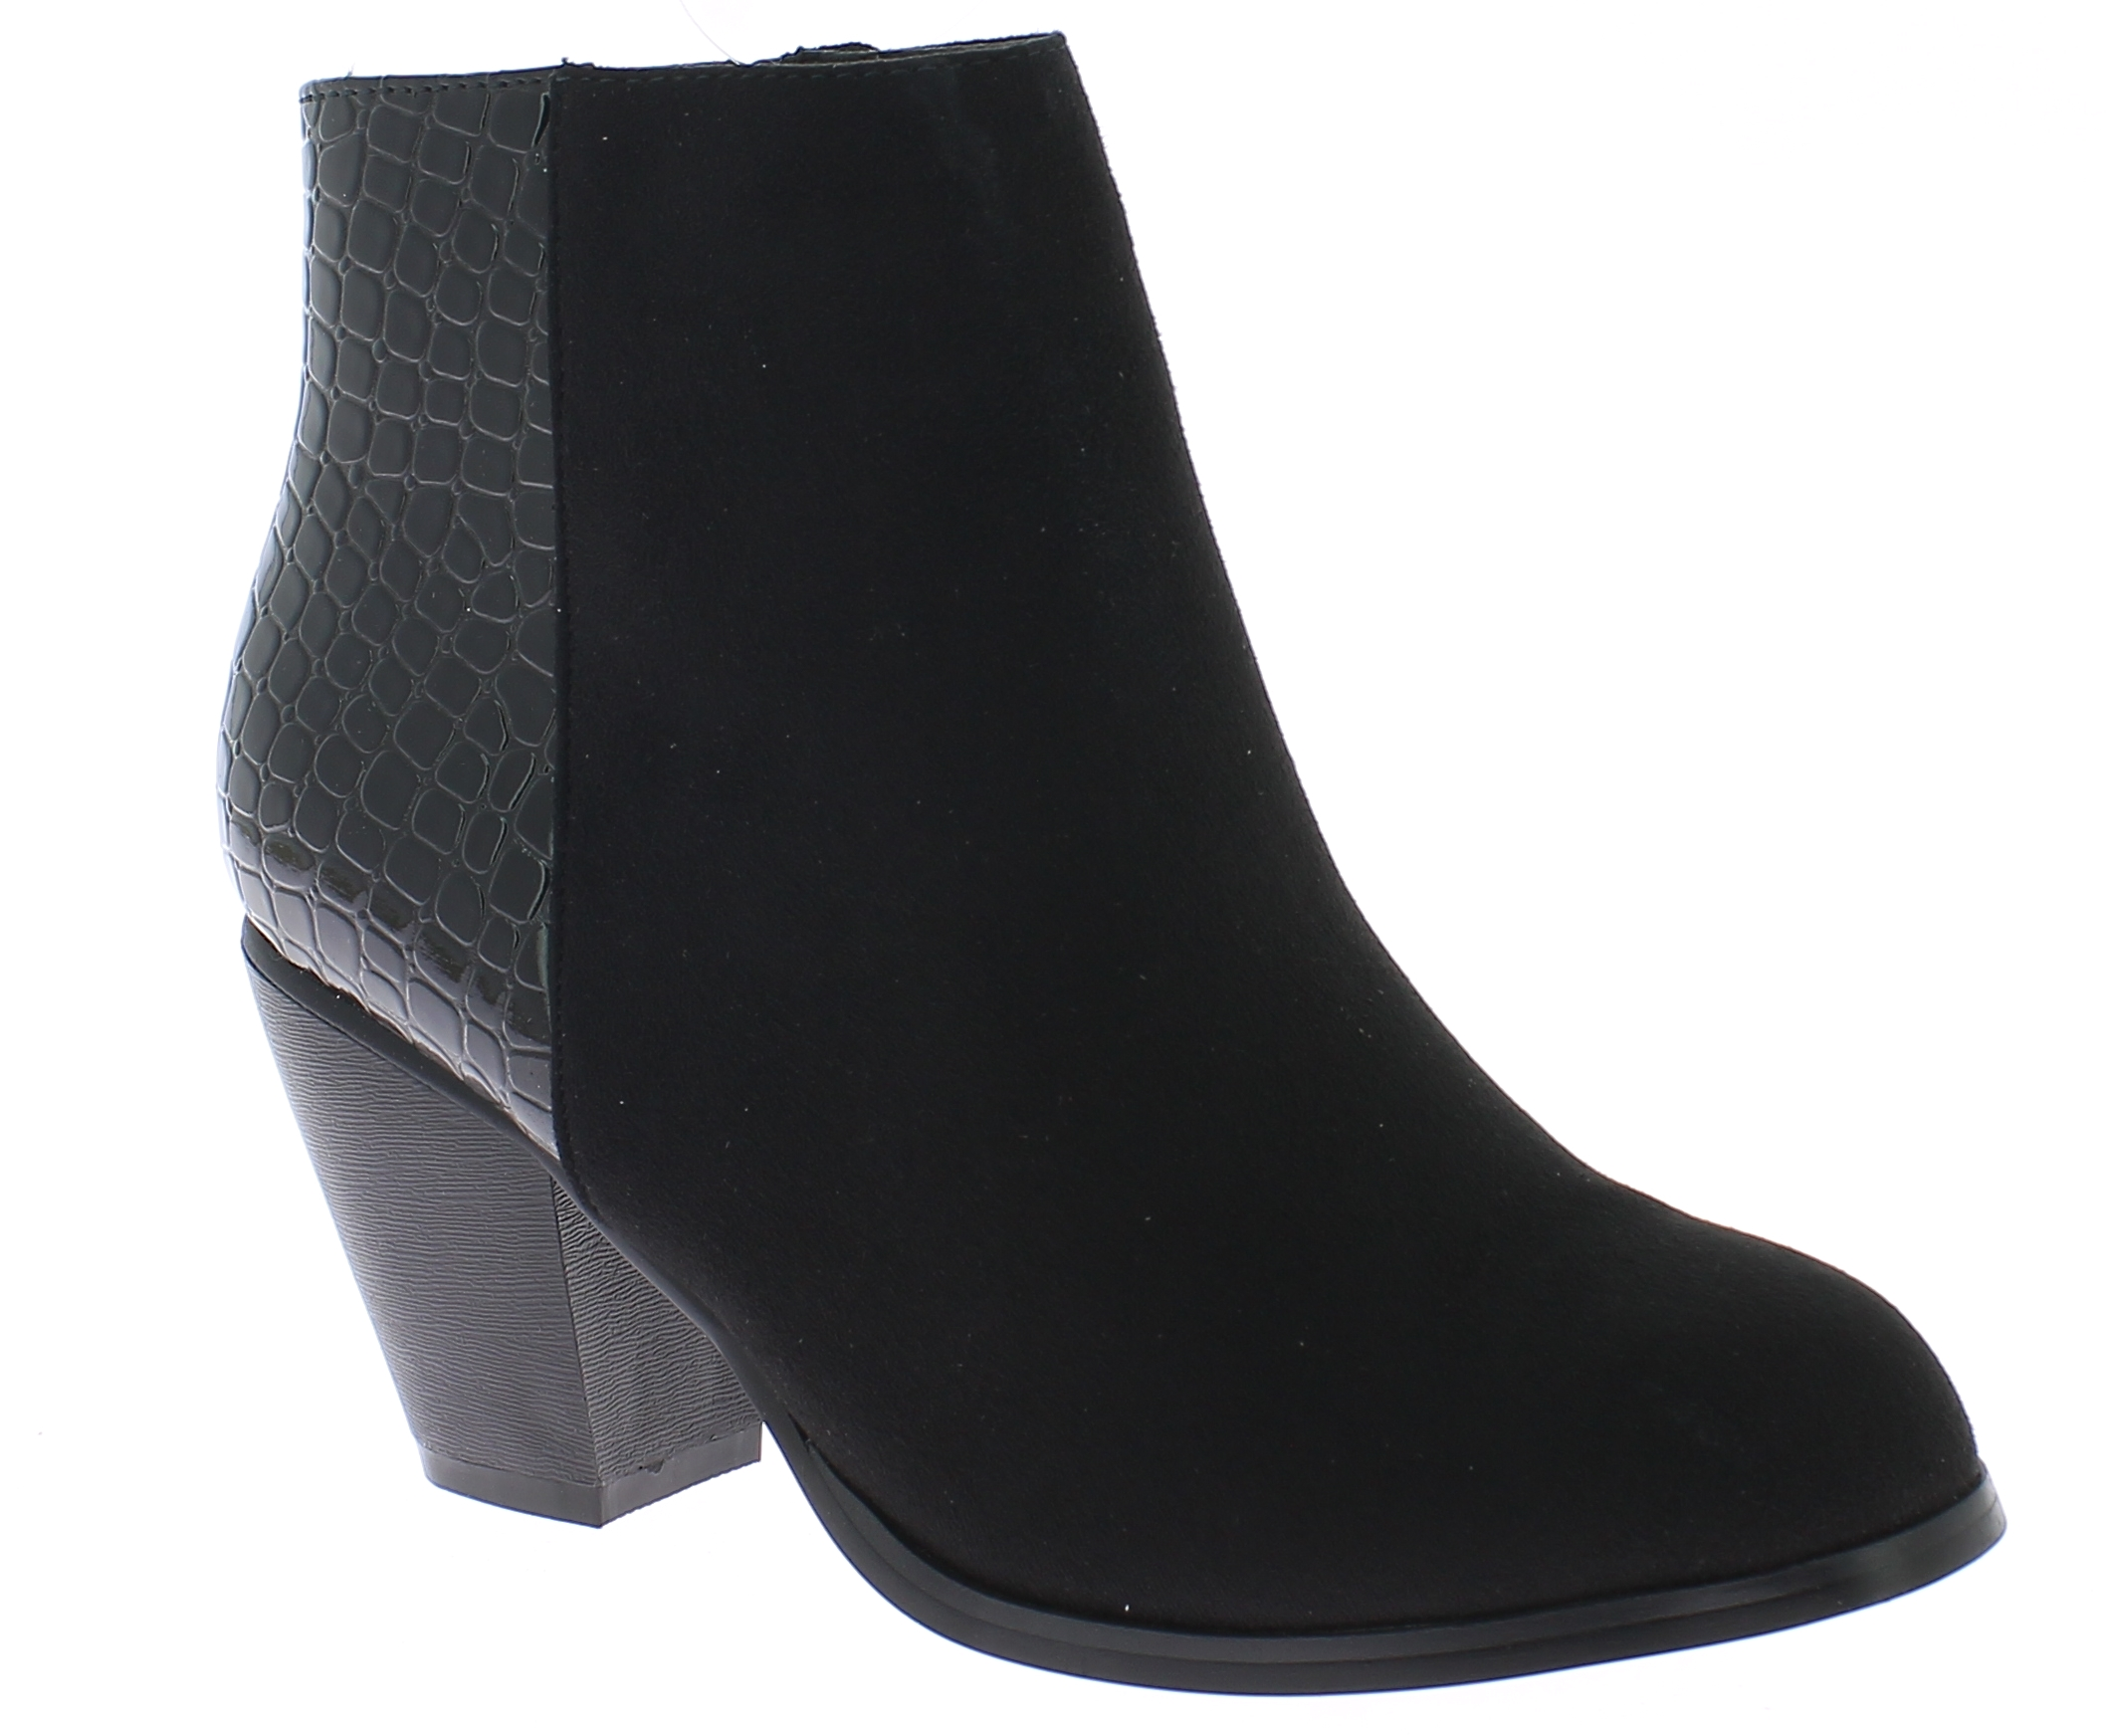 TOPWAY Γυναικείο Μποτάκι B094533 Μαύρο - IqShoes - B094533 BLACK-black-36/1/15/7 παπούτσια  γυναικεία μποτάκια